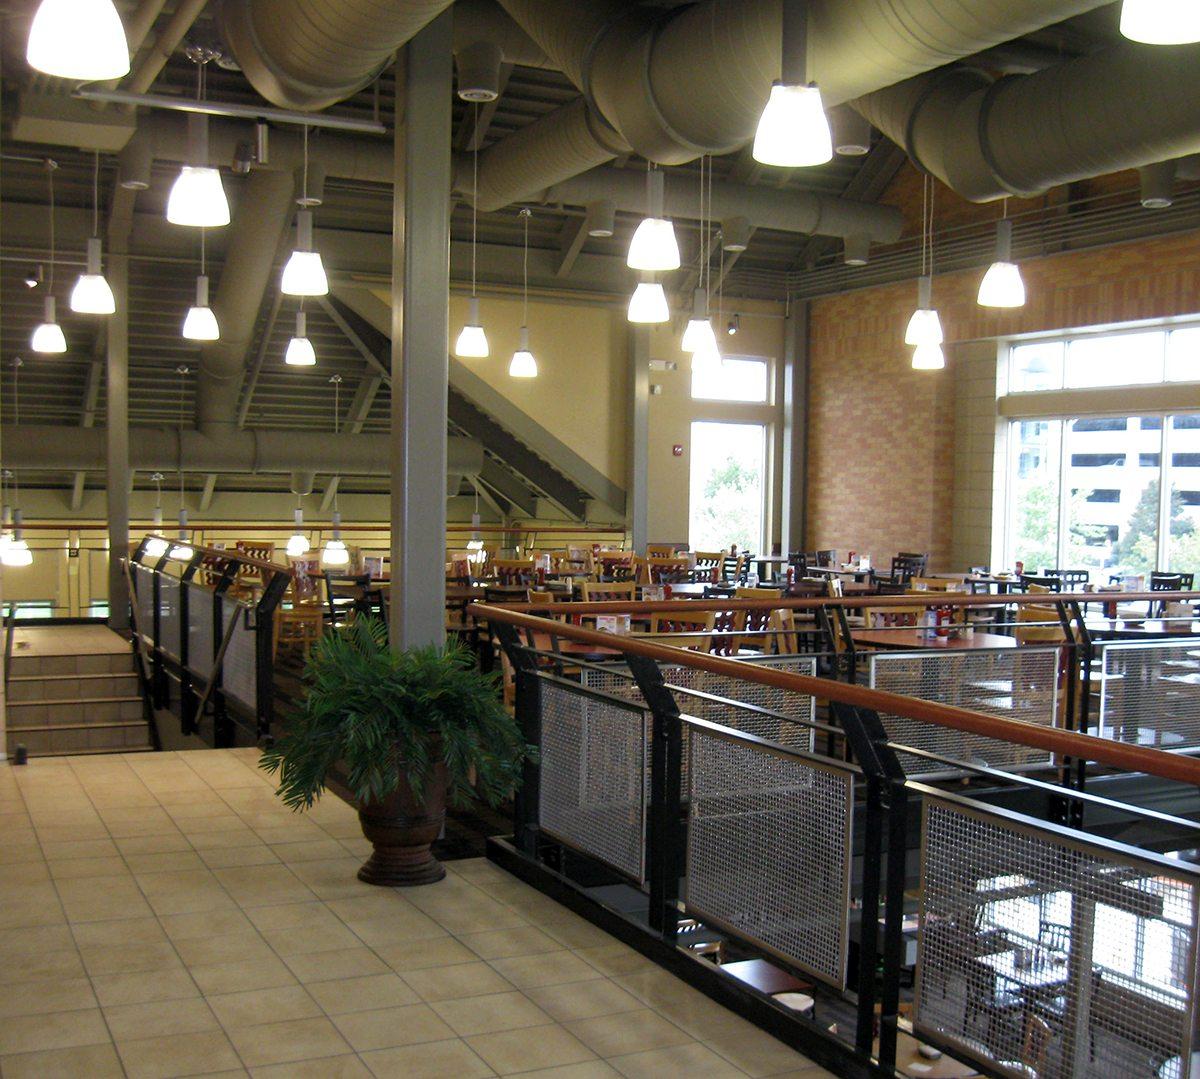 University of Missouri - Columbia Plaza 900